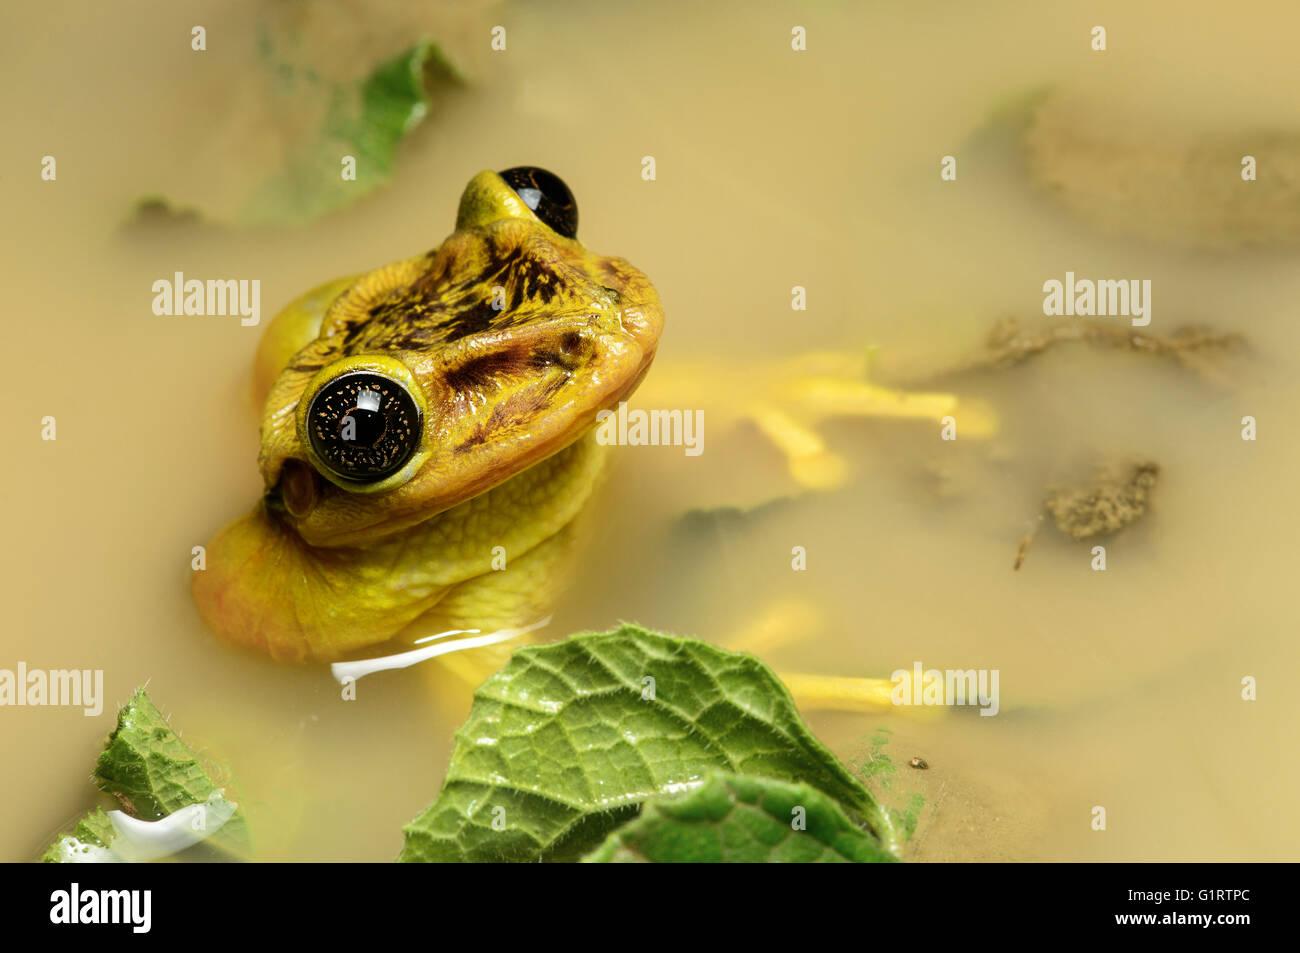 Tree frog Trachycephalus jordani (Trachycephalus jordani), male in a pond, Jorupe Parkland, Ecuador - Stock Image